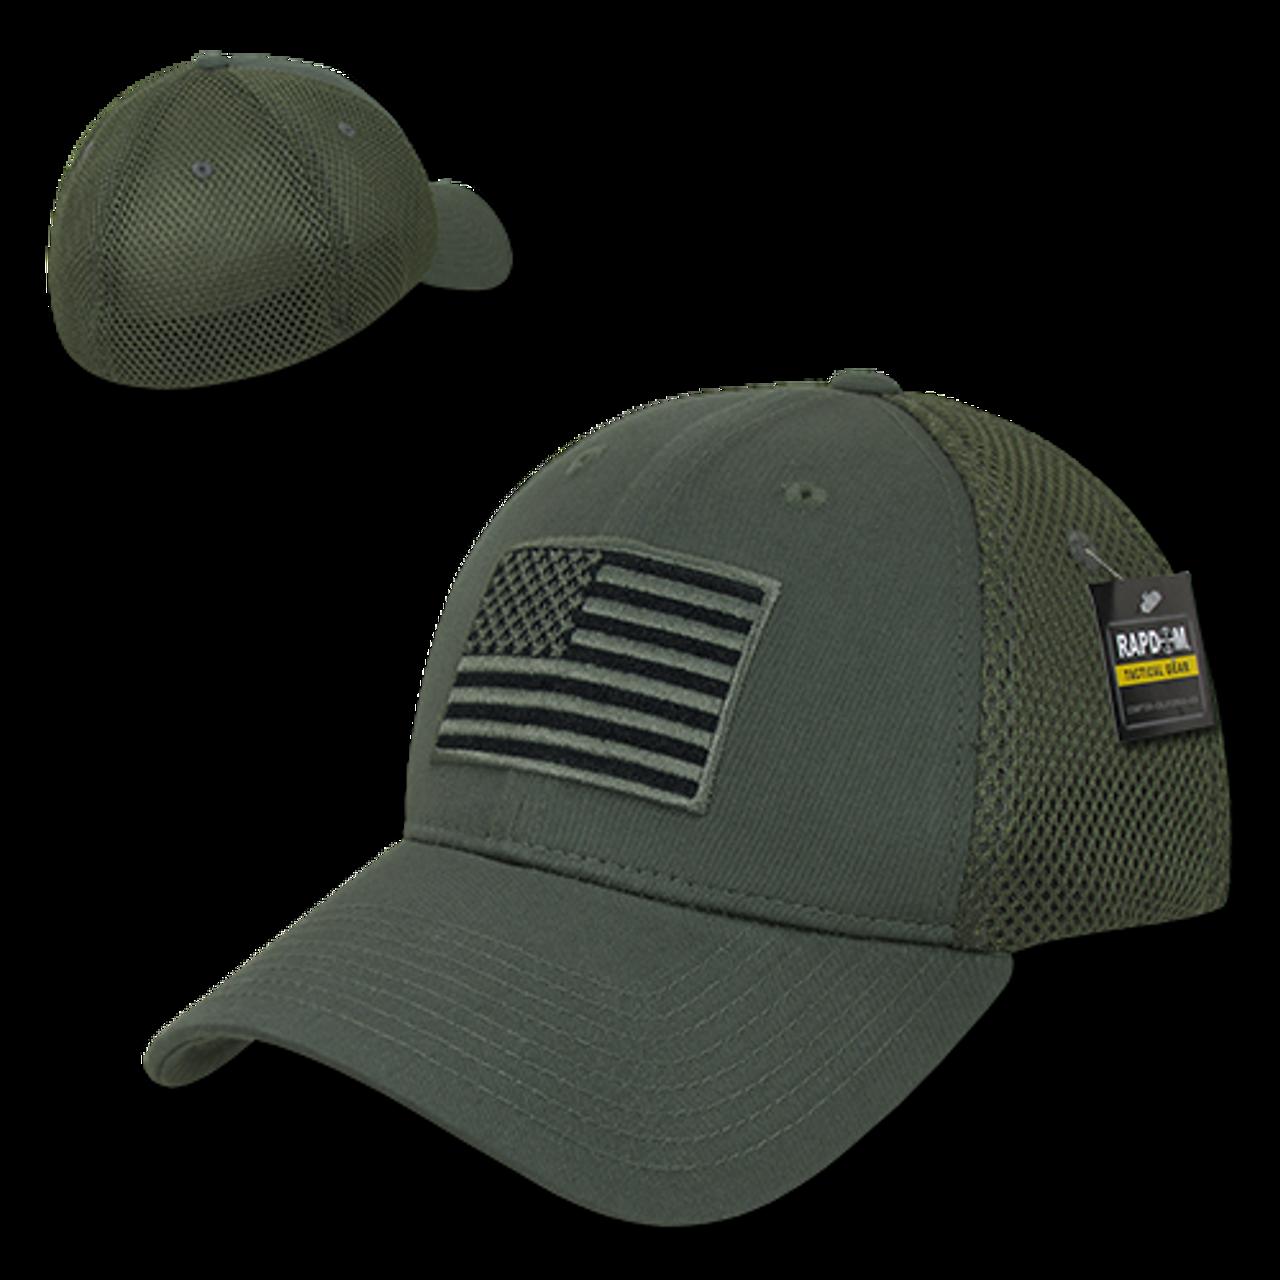 751c6bea251 T88 - Tactical Cap USA Flag - Low Crown Structured Air Mesh Flex - Olive  Drab - USMILITARYHATS.COM